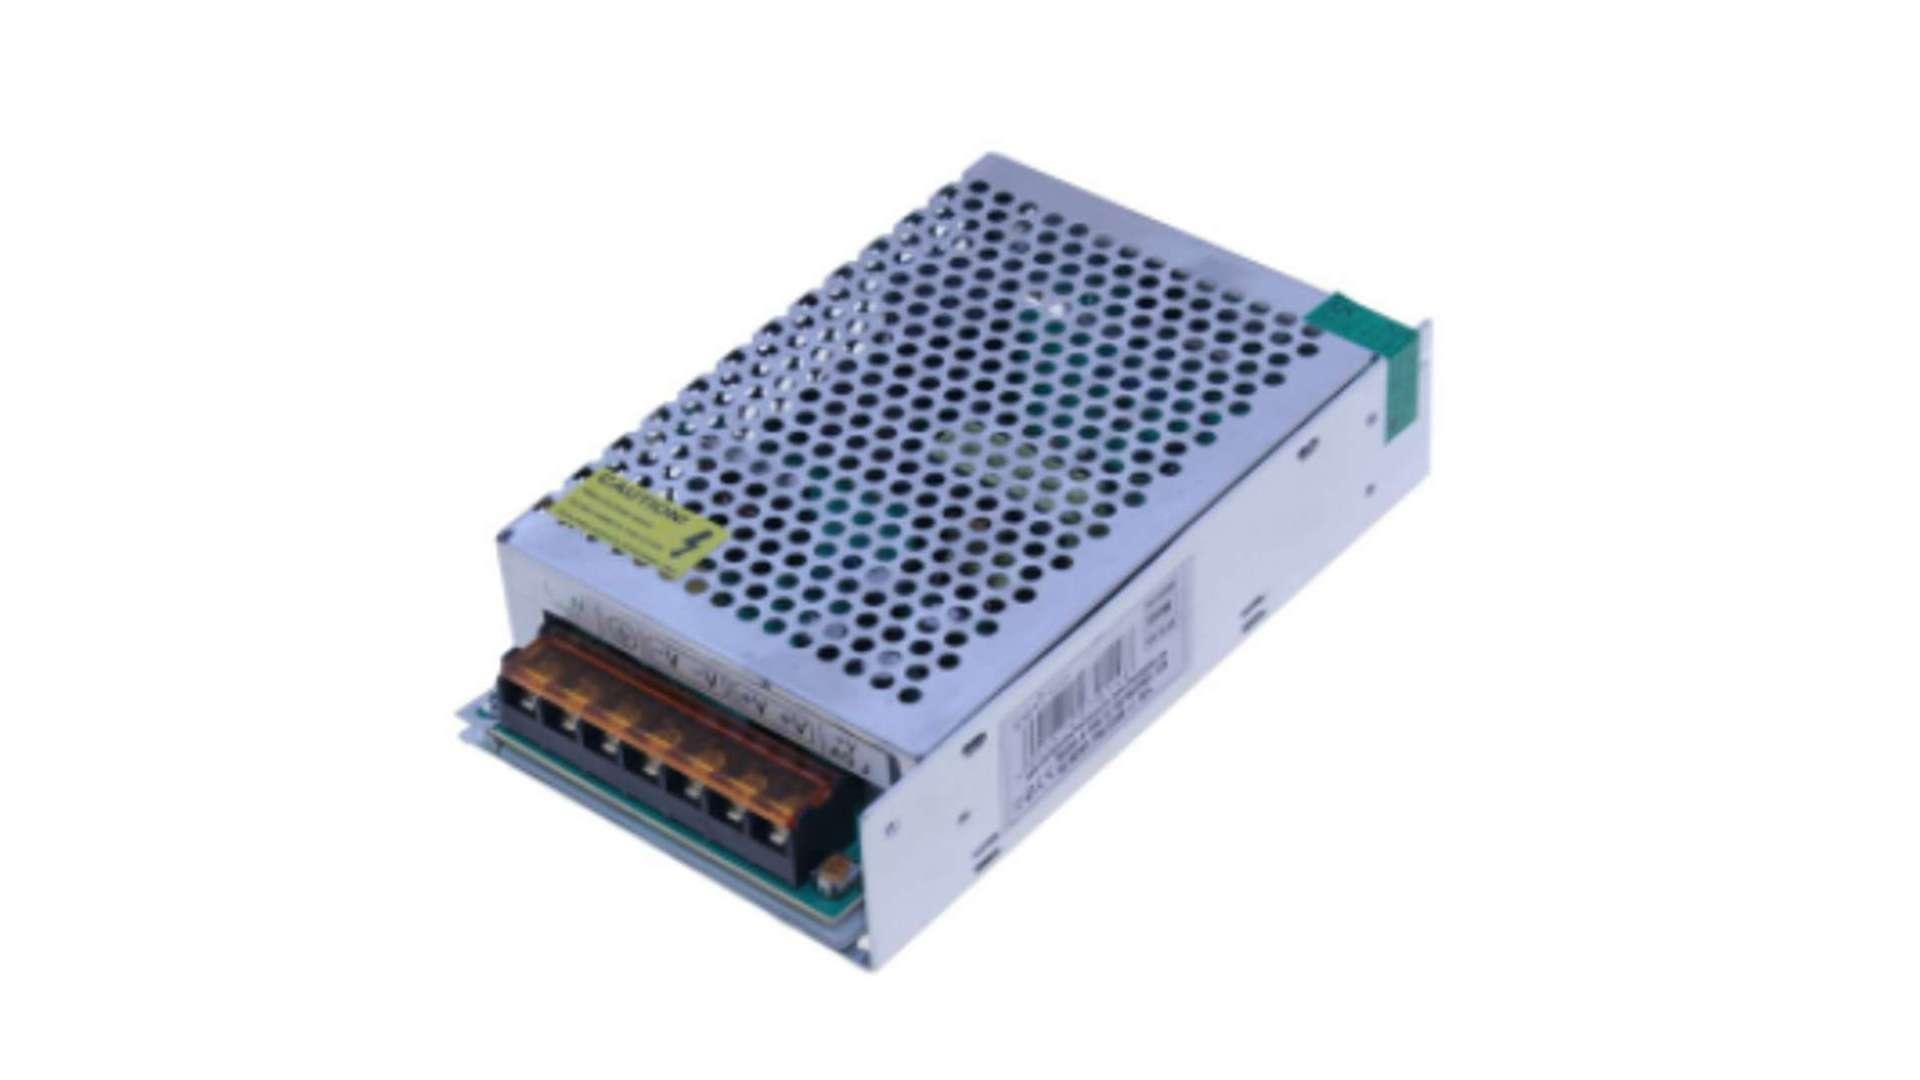 12V 250W IP20 enclosed power supply